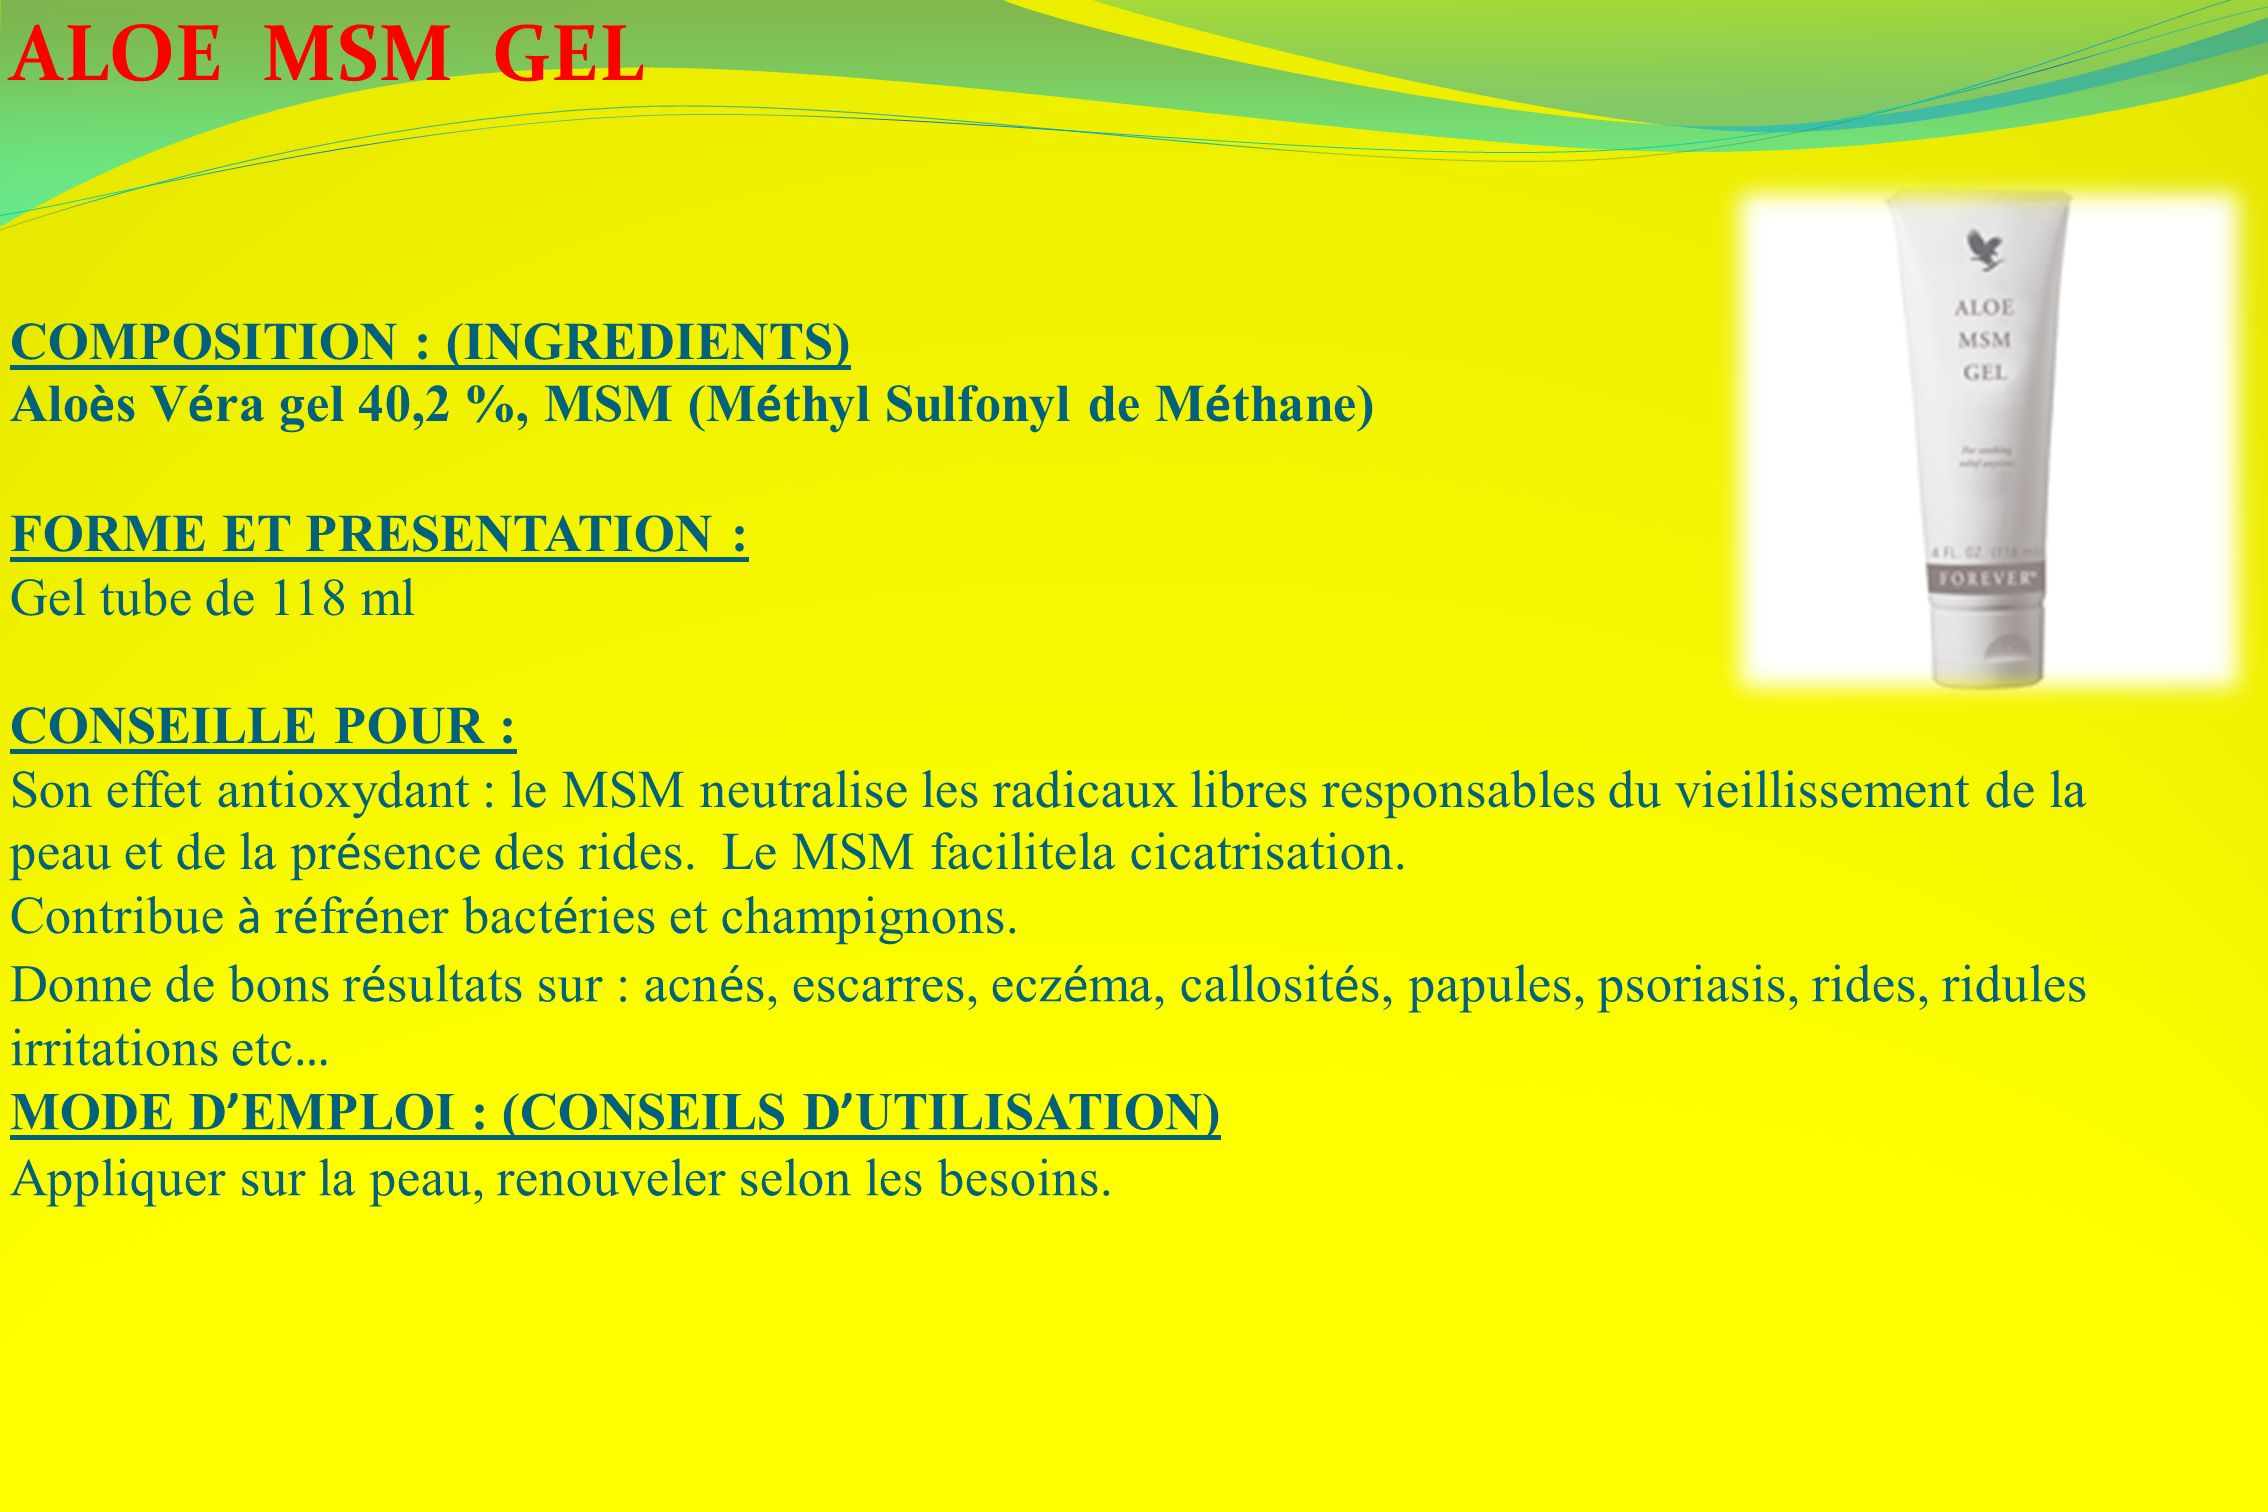 ALOE MSM GEL COMPOSITION : (INGREDIENTS) Alo è s V é ra gel 40,2 %, MSM (M é thyl Sulfonyl de M é thane) FORME ET PRESENTATION : Gel tube de 118 ml CO